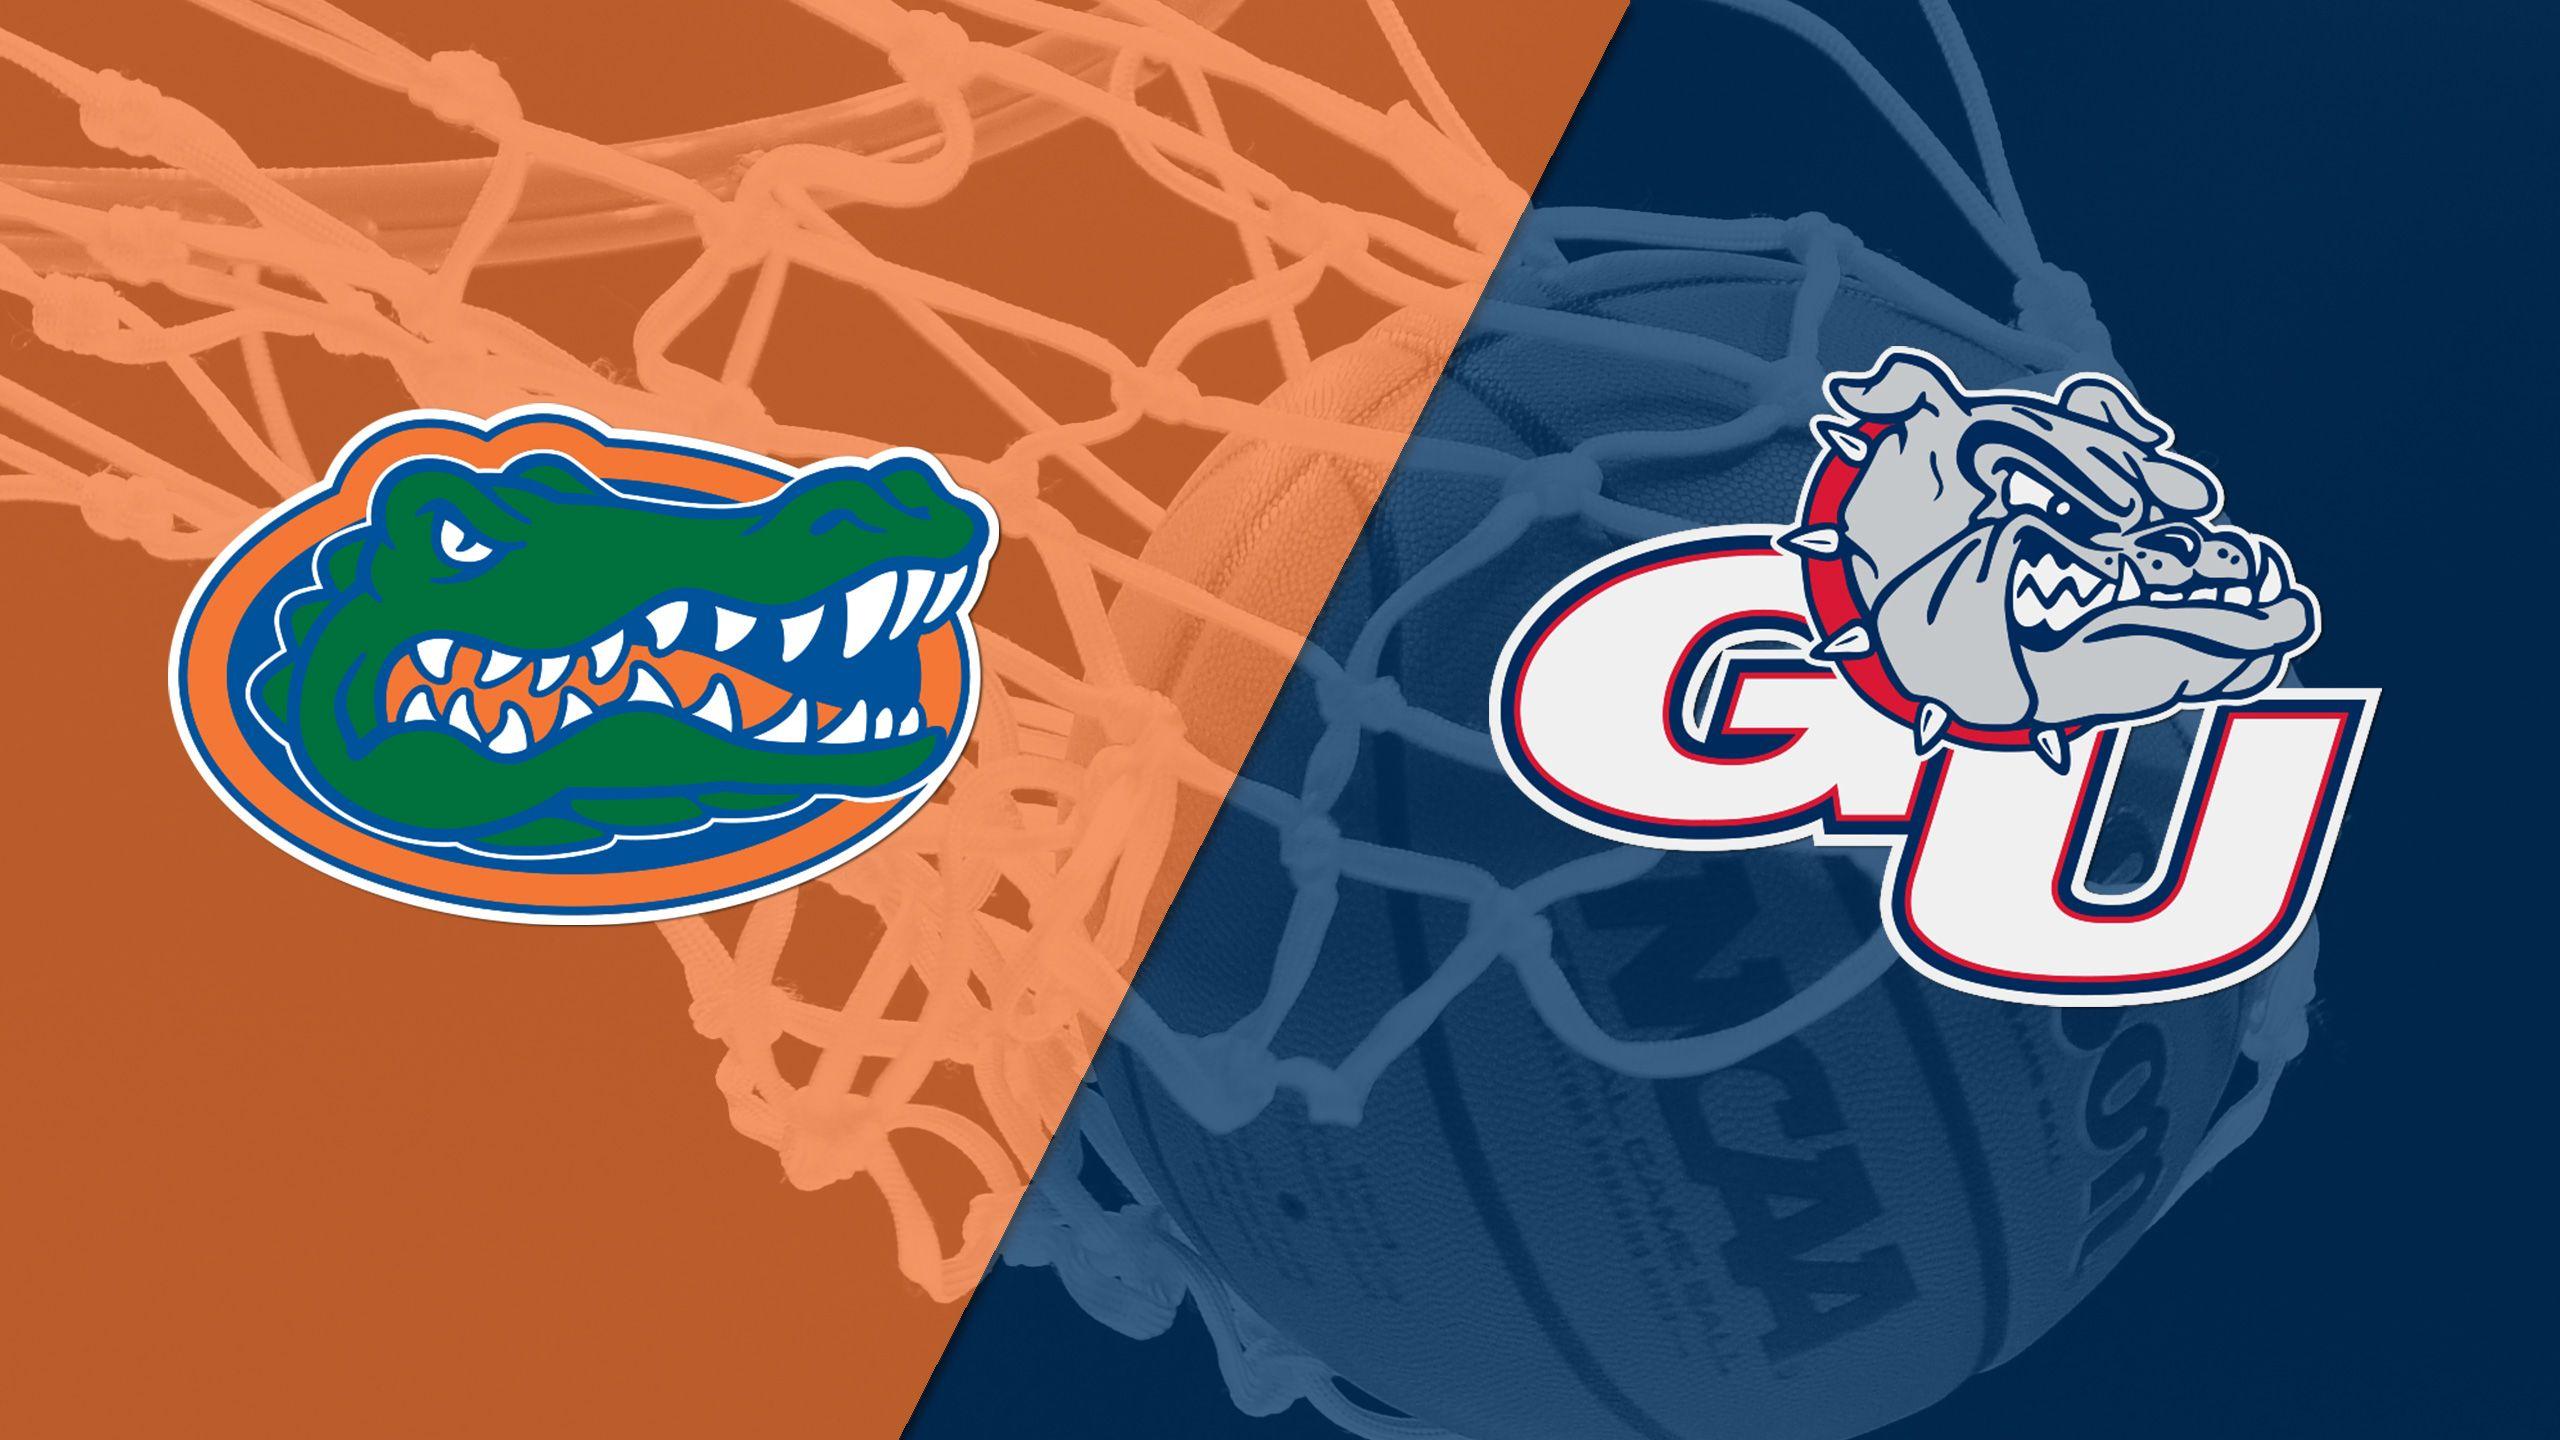 #7 Florida vs. #17 Gonzaga (Semifinal #2) (PK80)